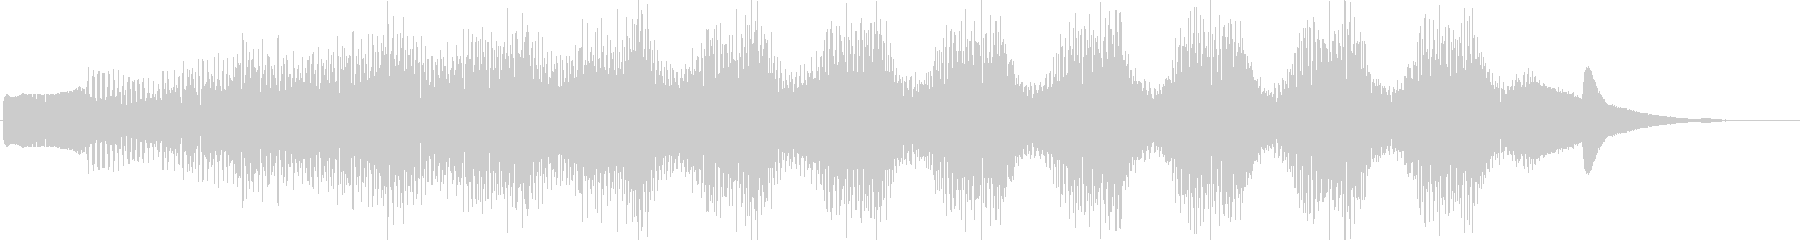 KANT考えてる時の音効果音08312の未再生の波形